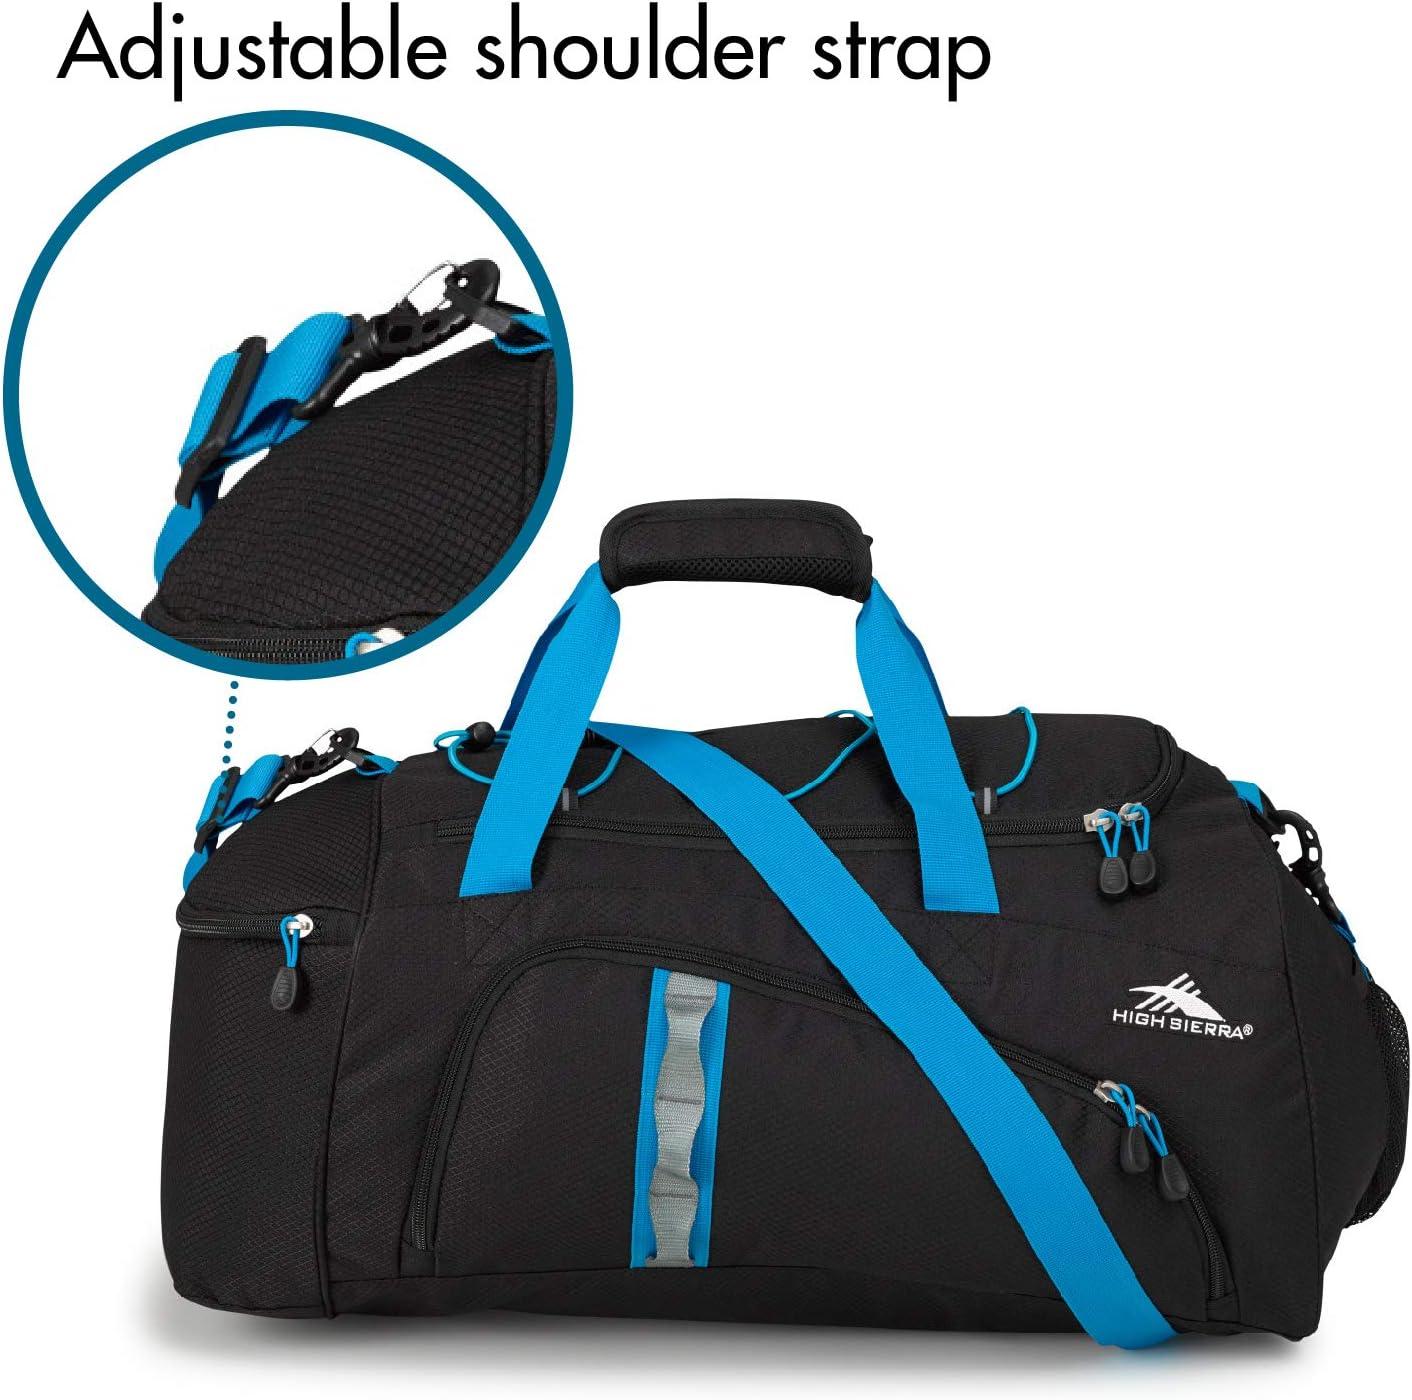 High Sierra Cross Sport 2 Duffels Jitter Duffel Bag Cargo Shoulder Bag for Men